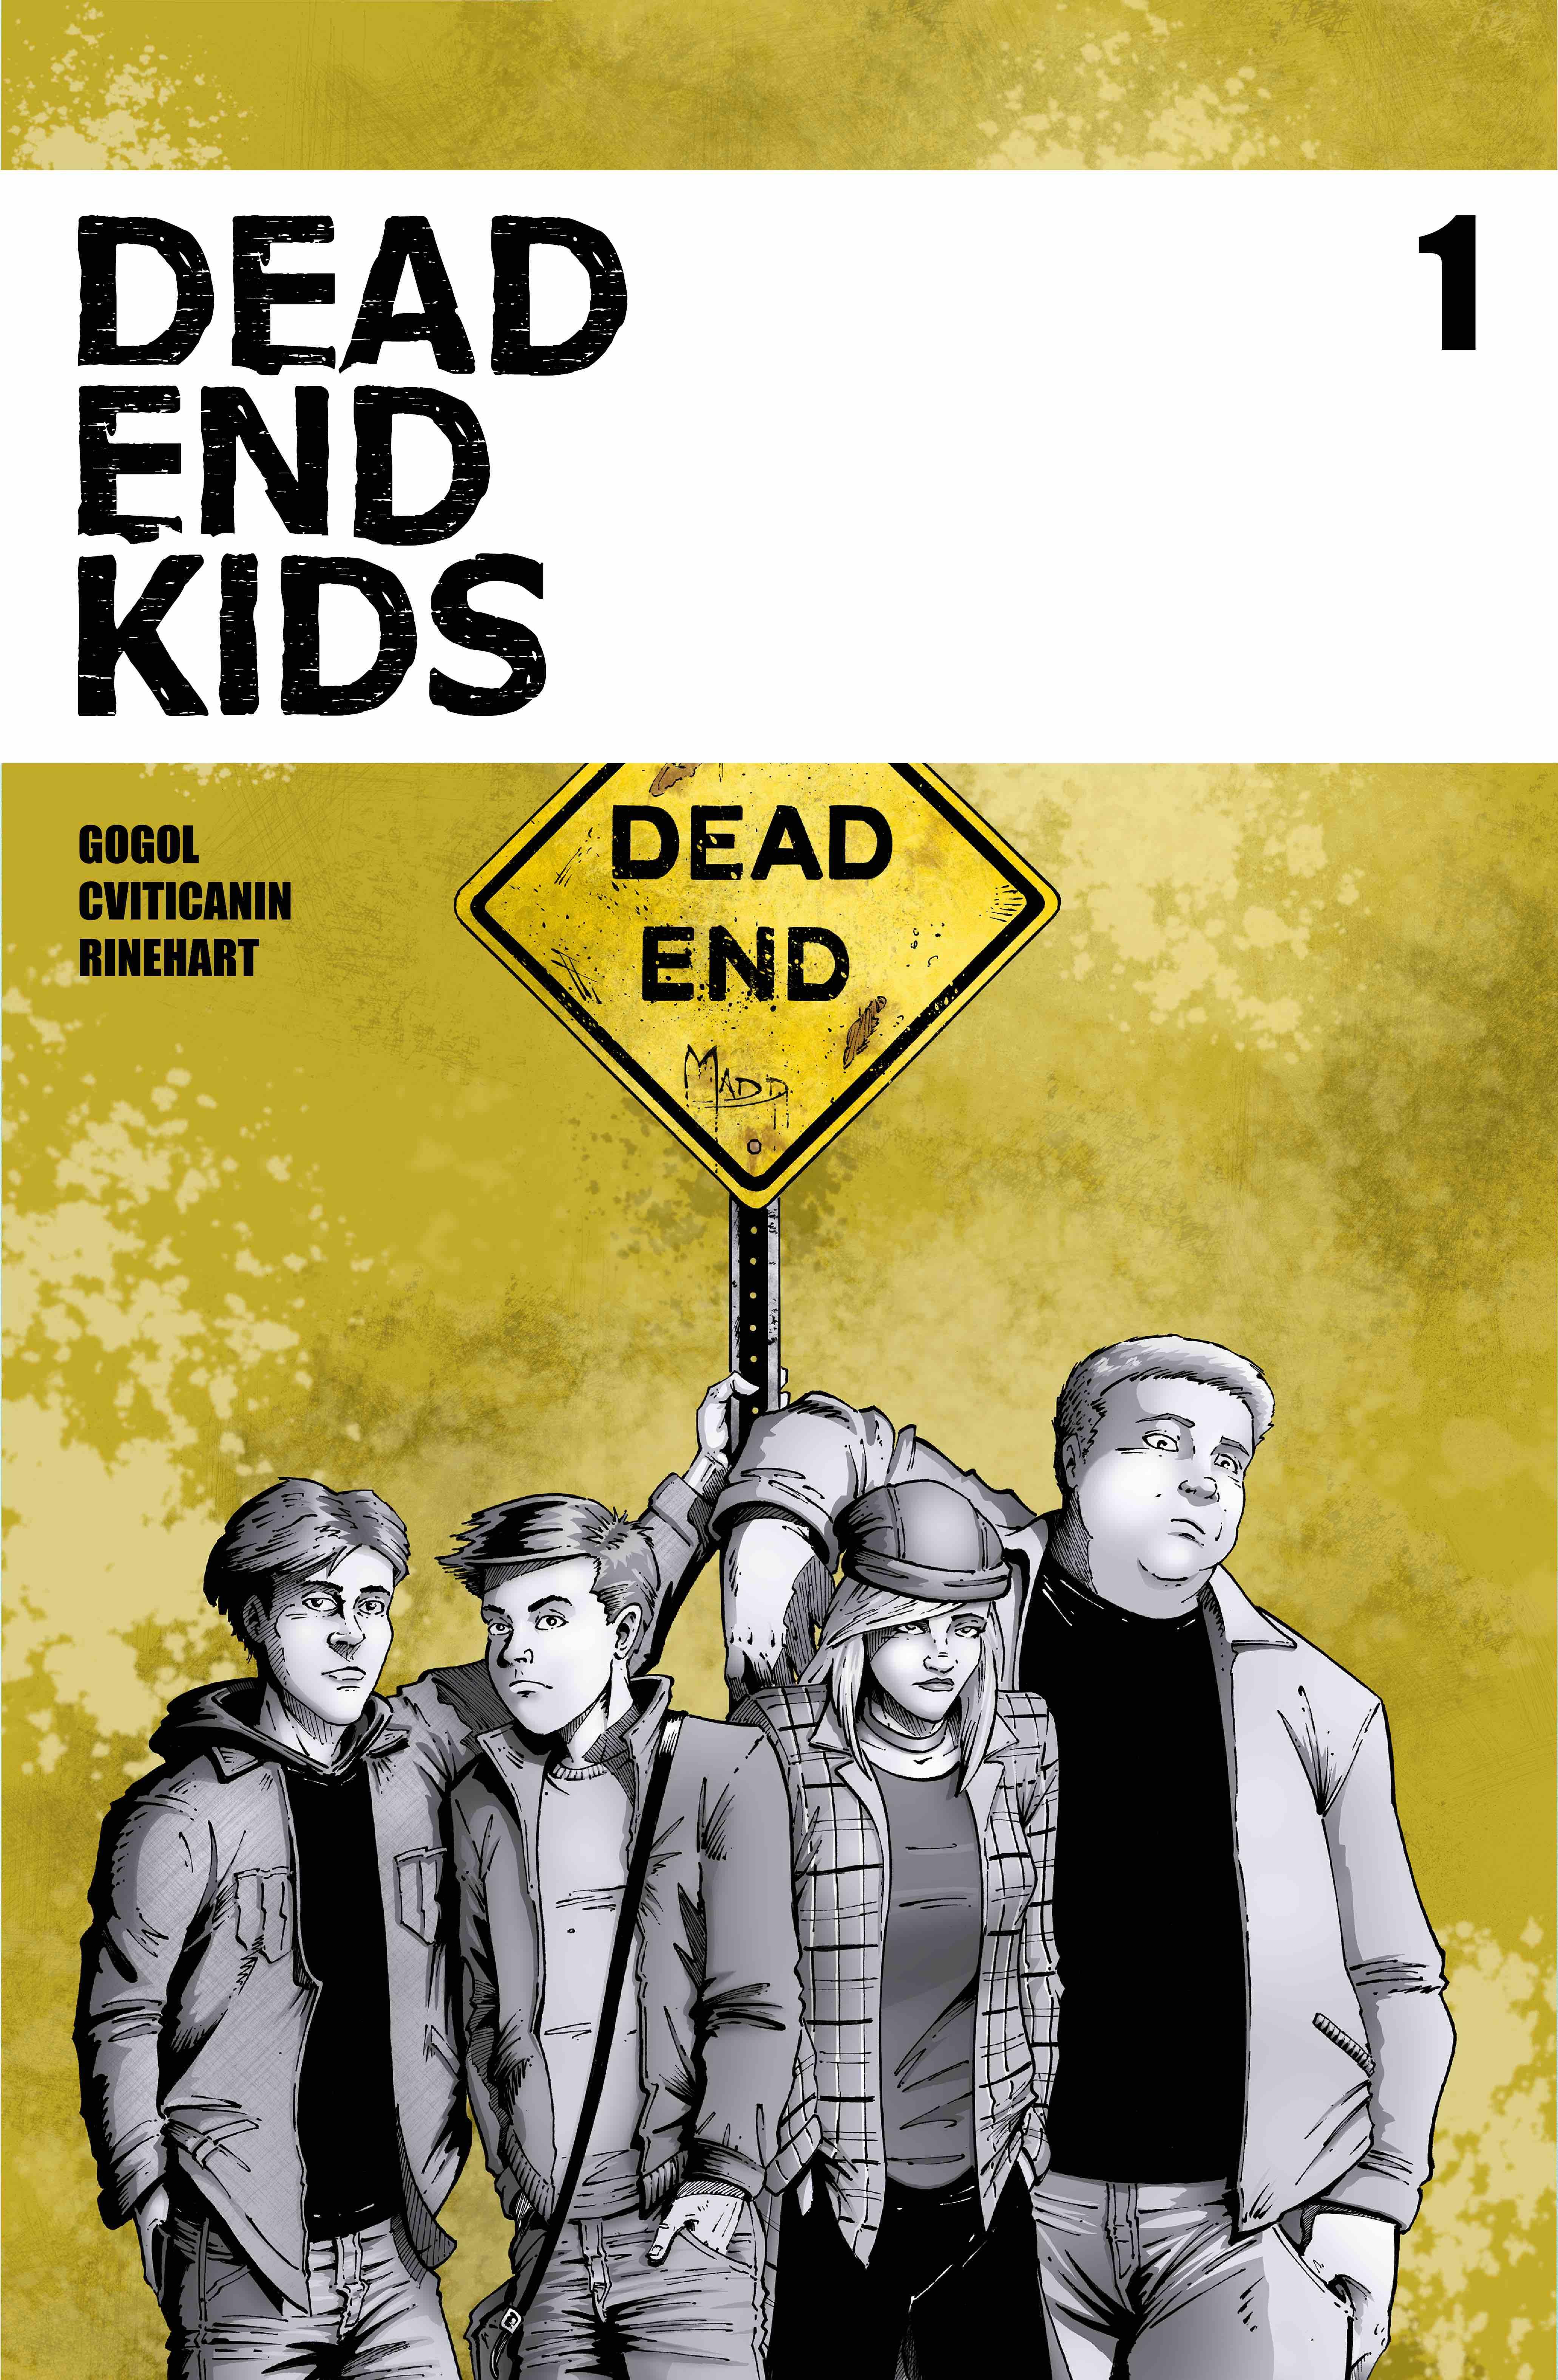 Frank Gogol, Dead End Kids #1, Source